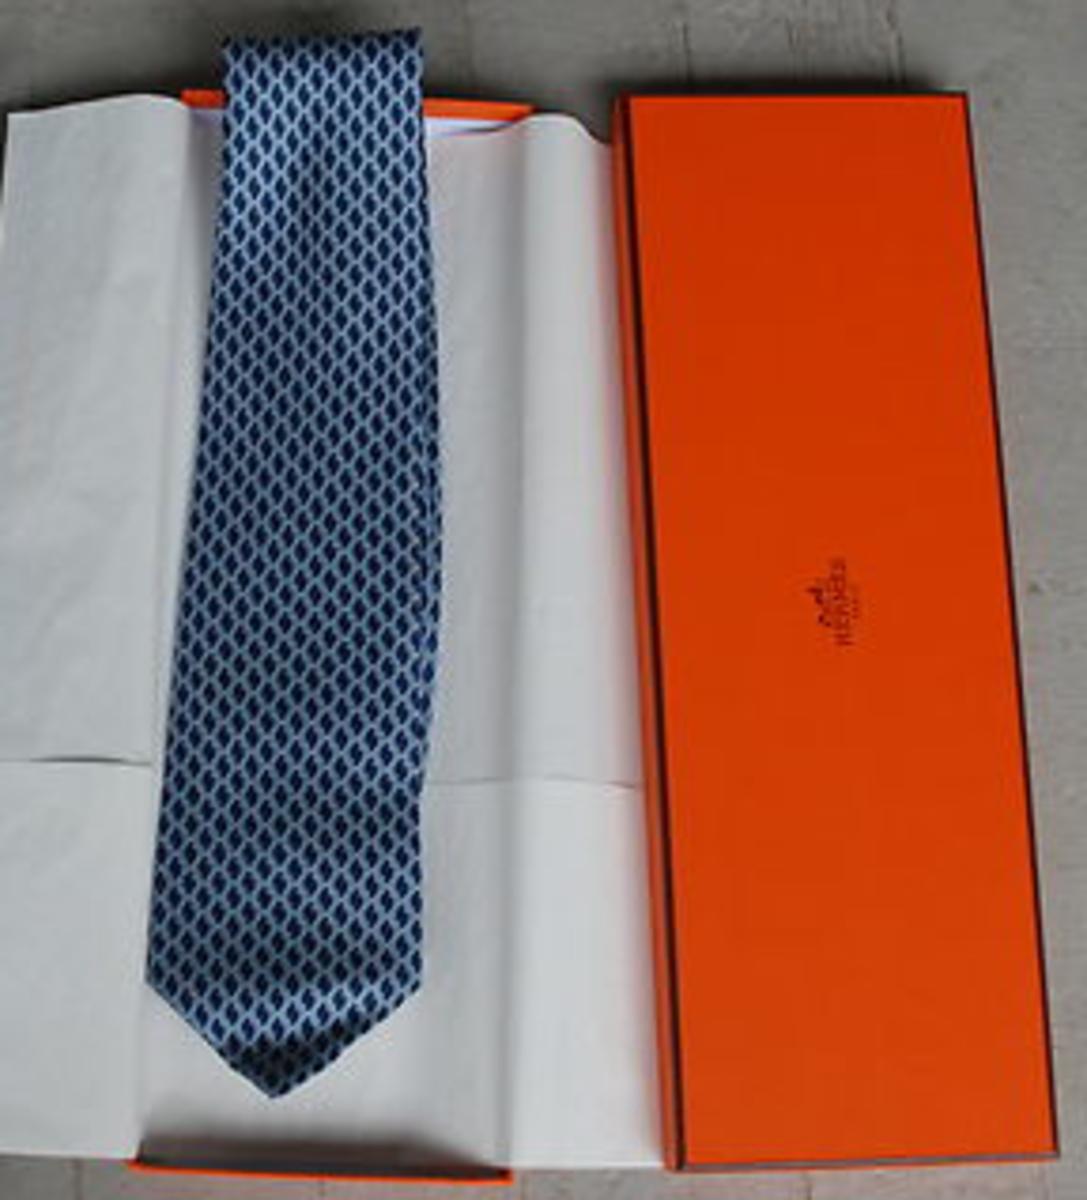 crocodile hermes birkin bag - How to Spot a Fake Hermes Tie - Learn to Identify Counterfeit ...